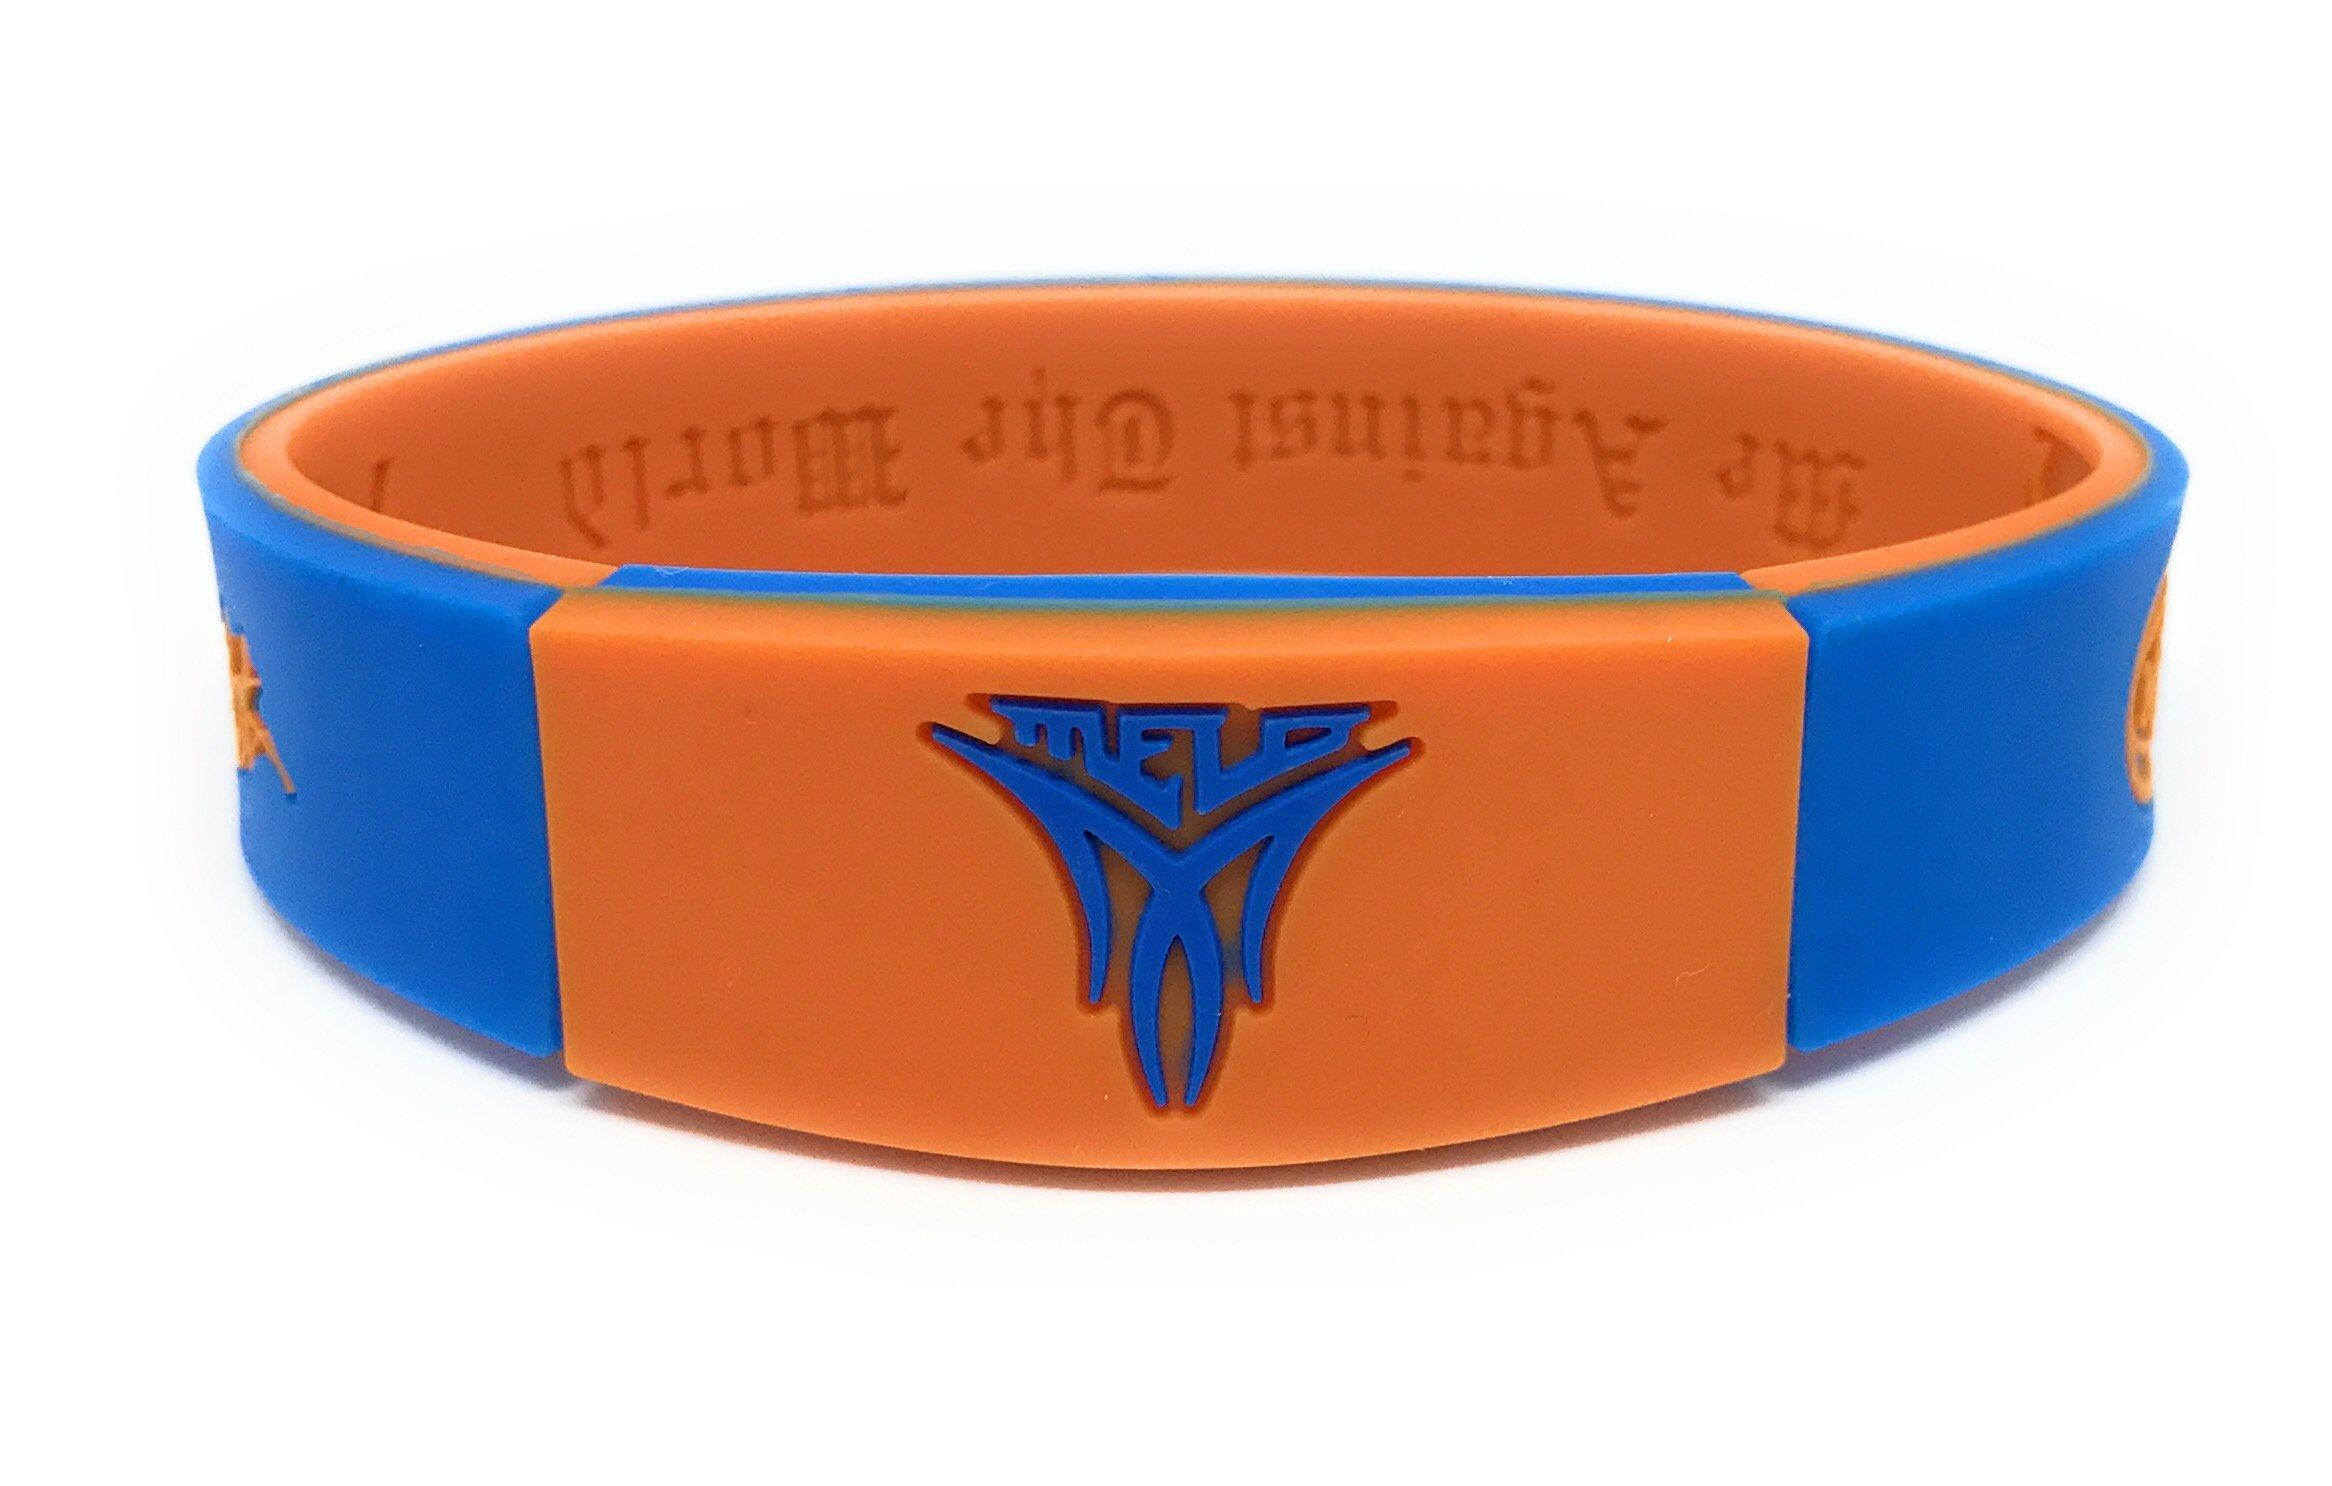 SportsBraceletsPro Reversible Wristband Adult/Teen 7.7'' Size Bracelets (Carmelo Orange/Blue)